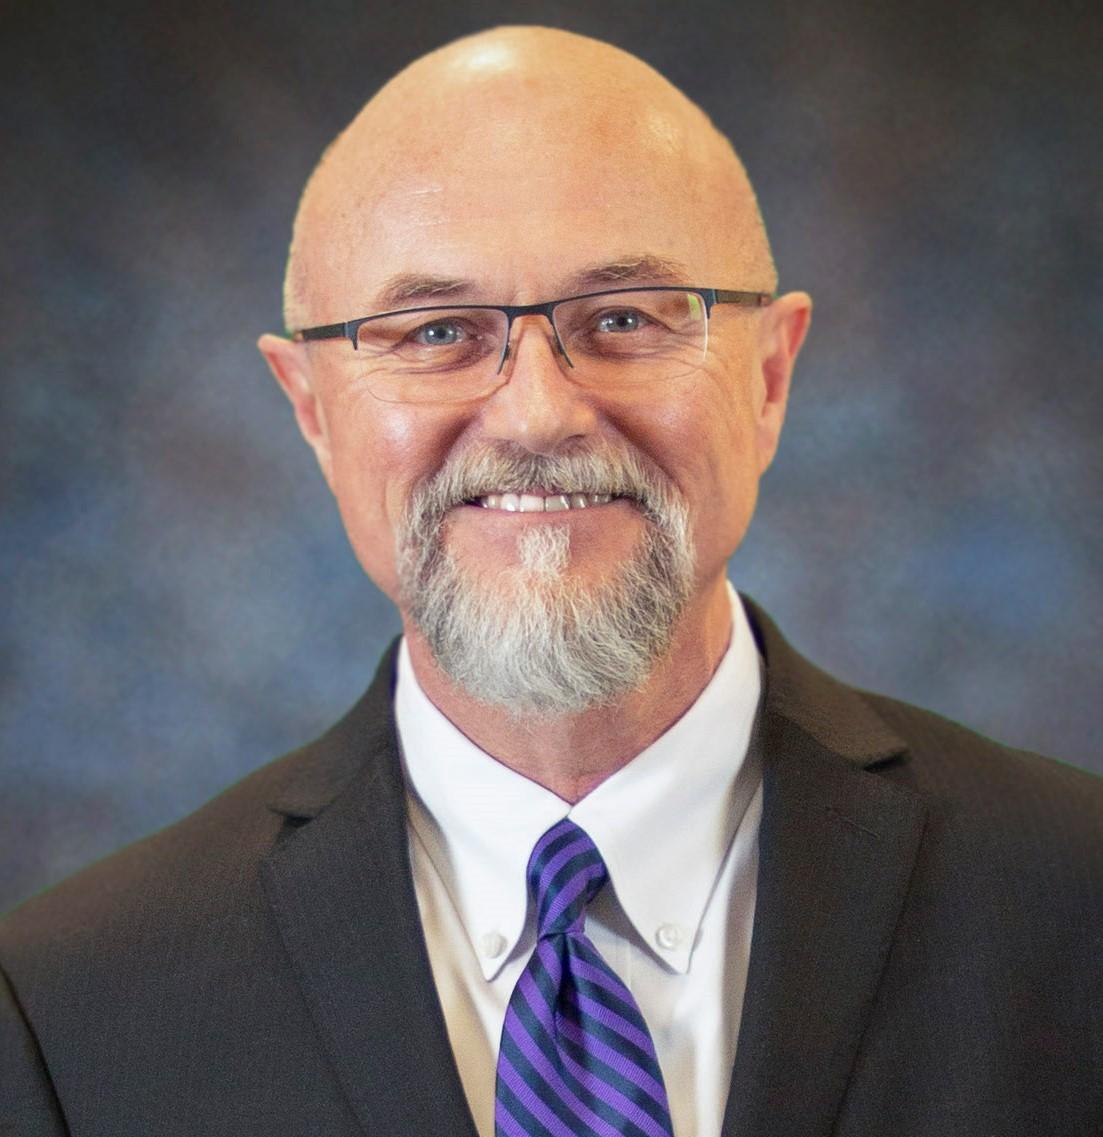 Dr. Ric Neal Baser